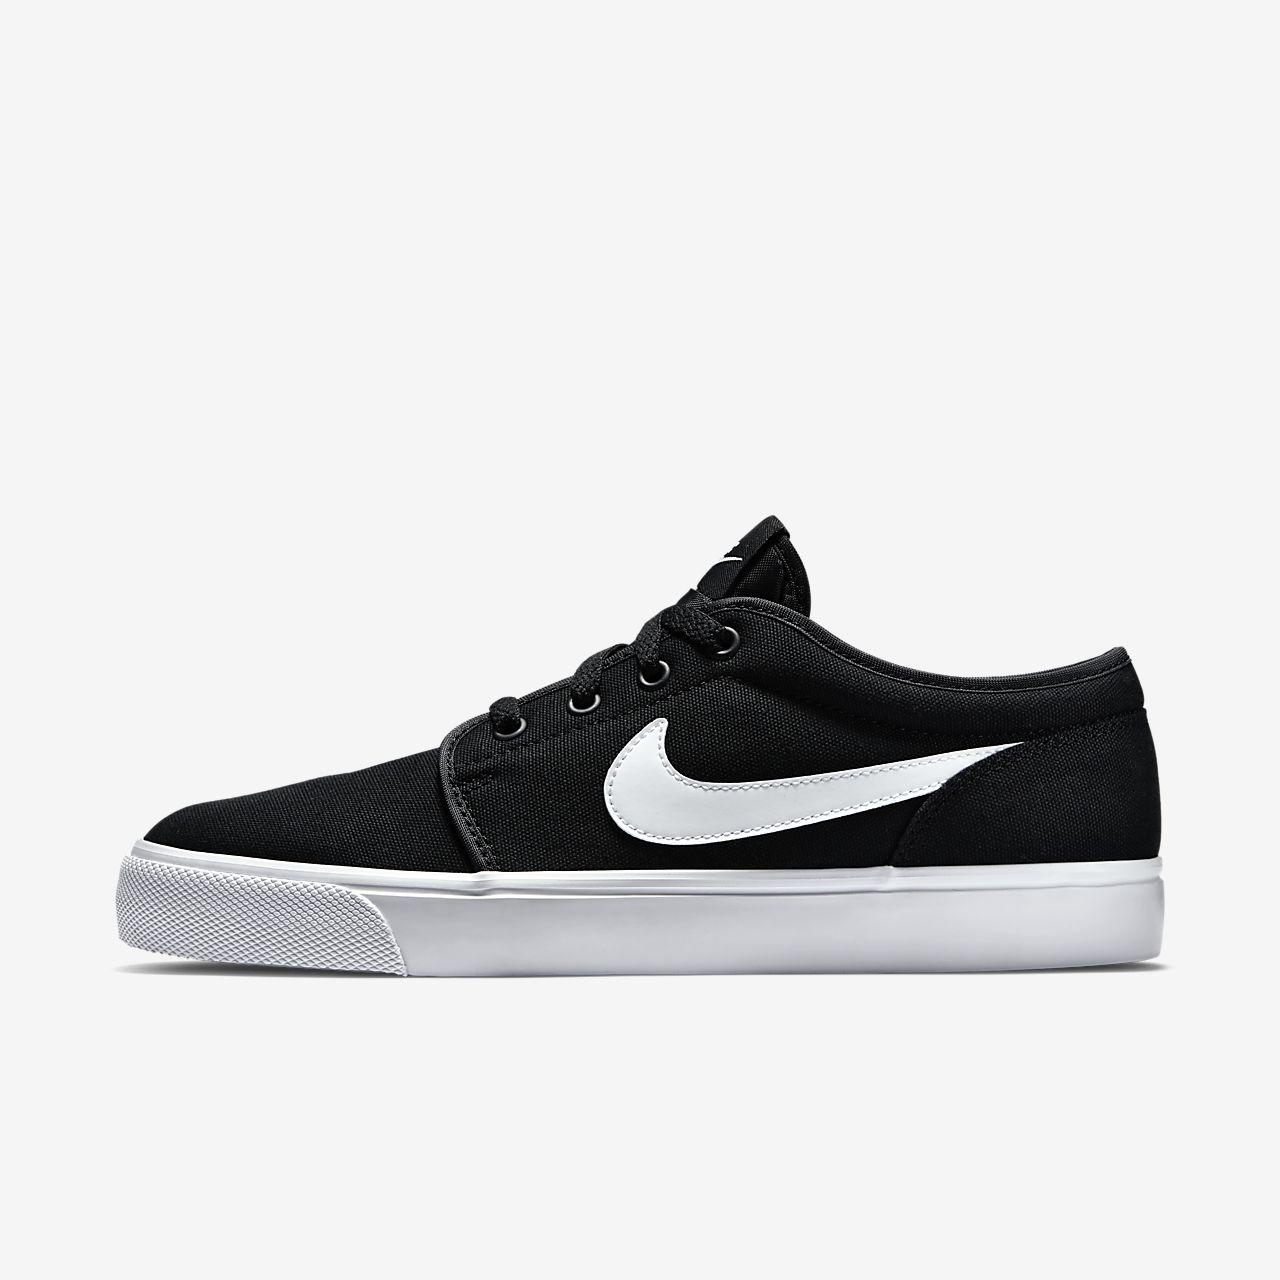 online store e3956 6bbb1 ... Nike Toki Low Textile Men s Shoe